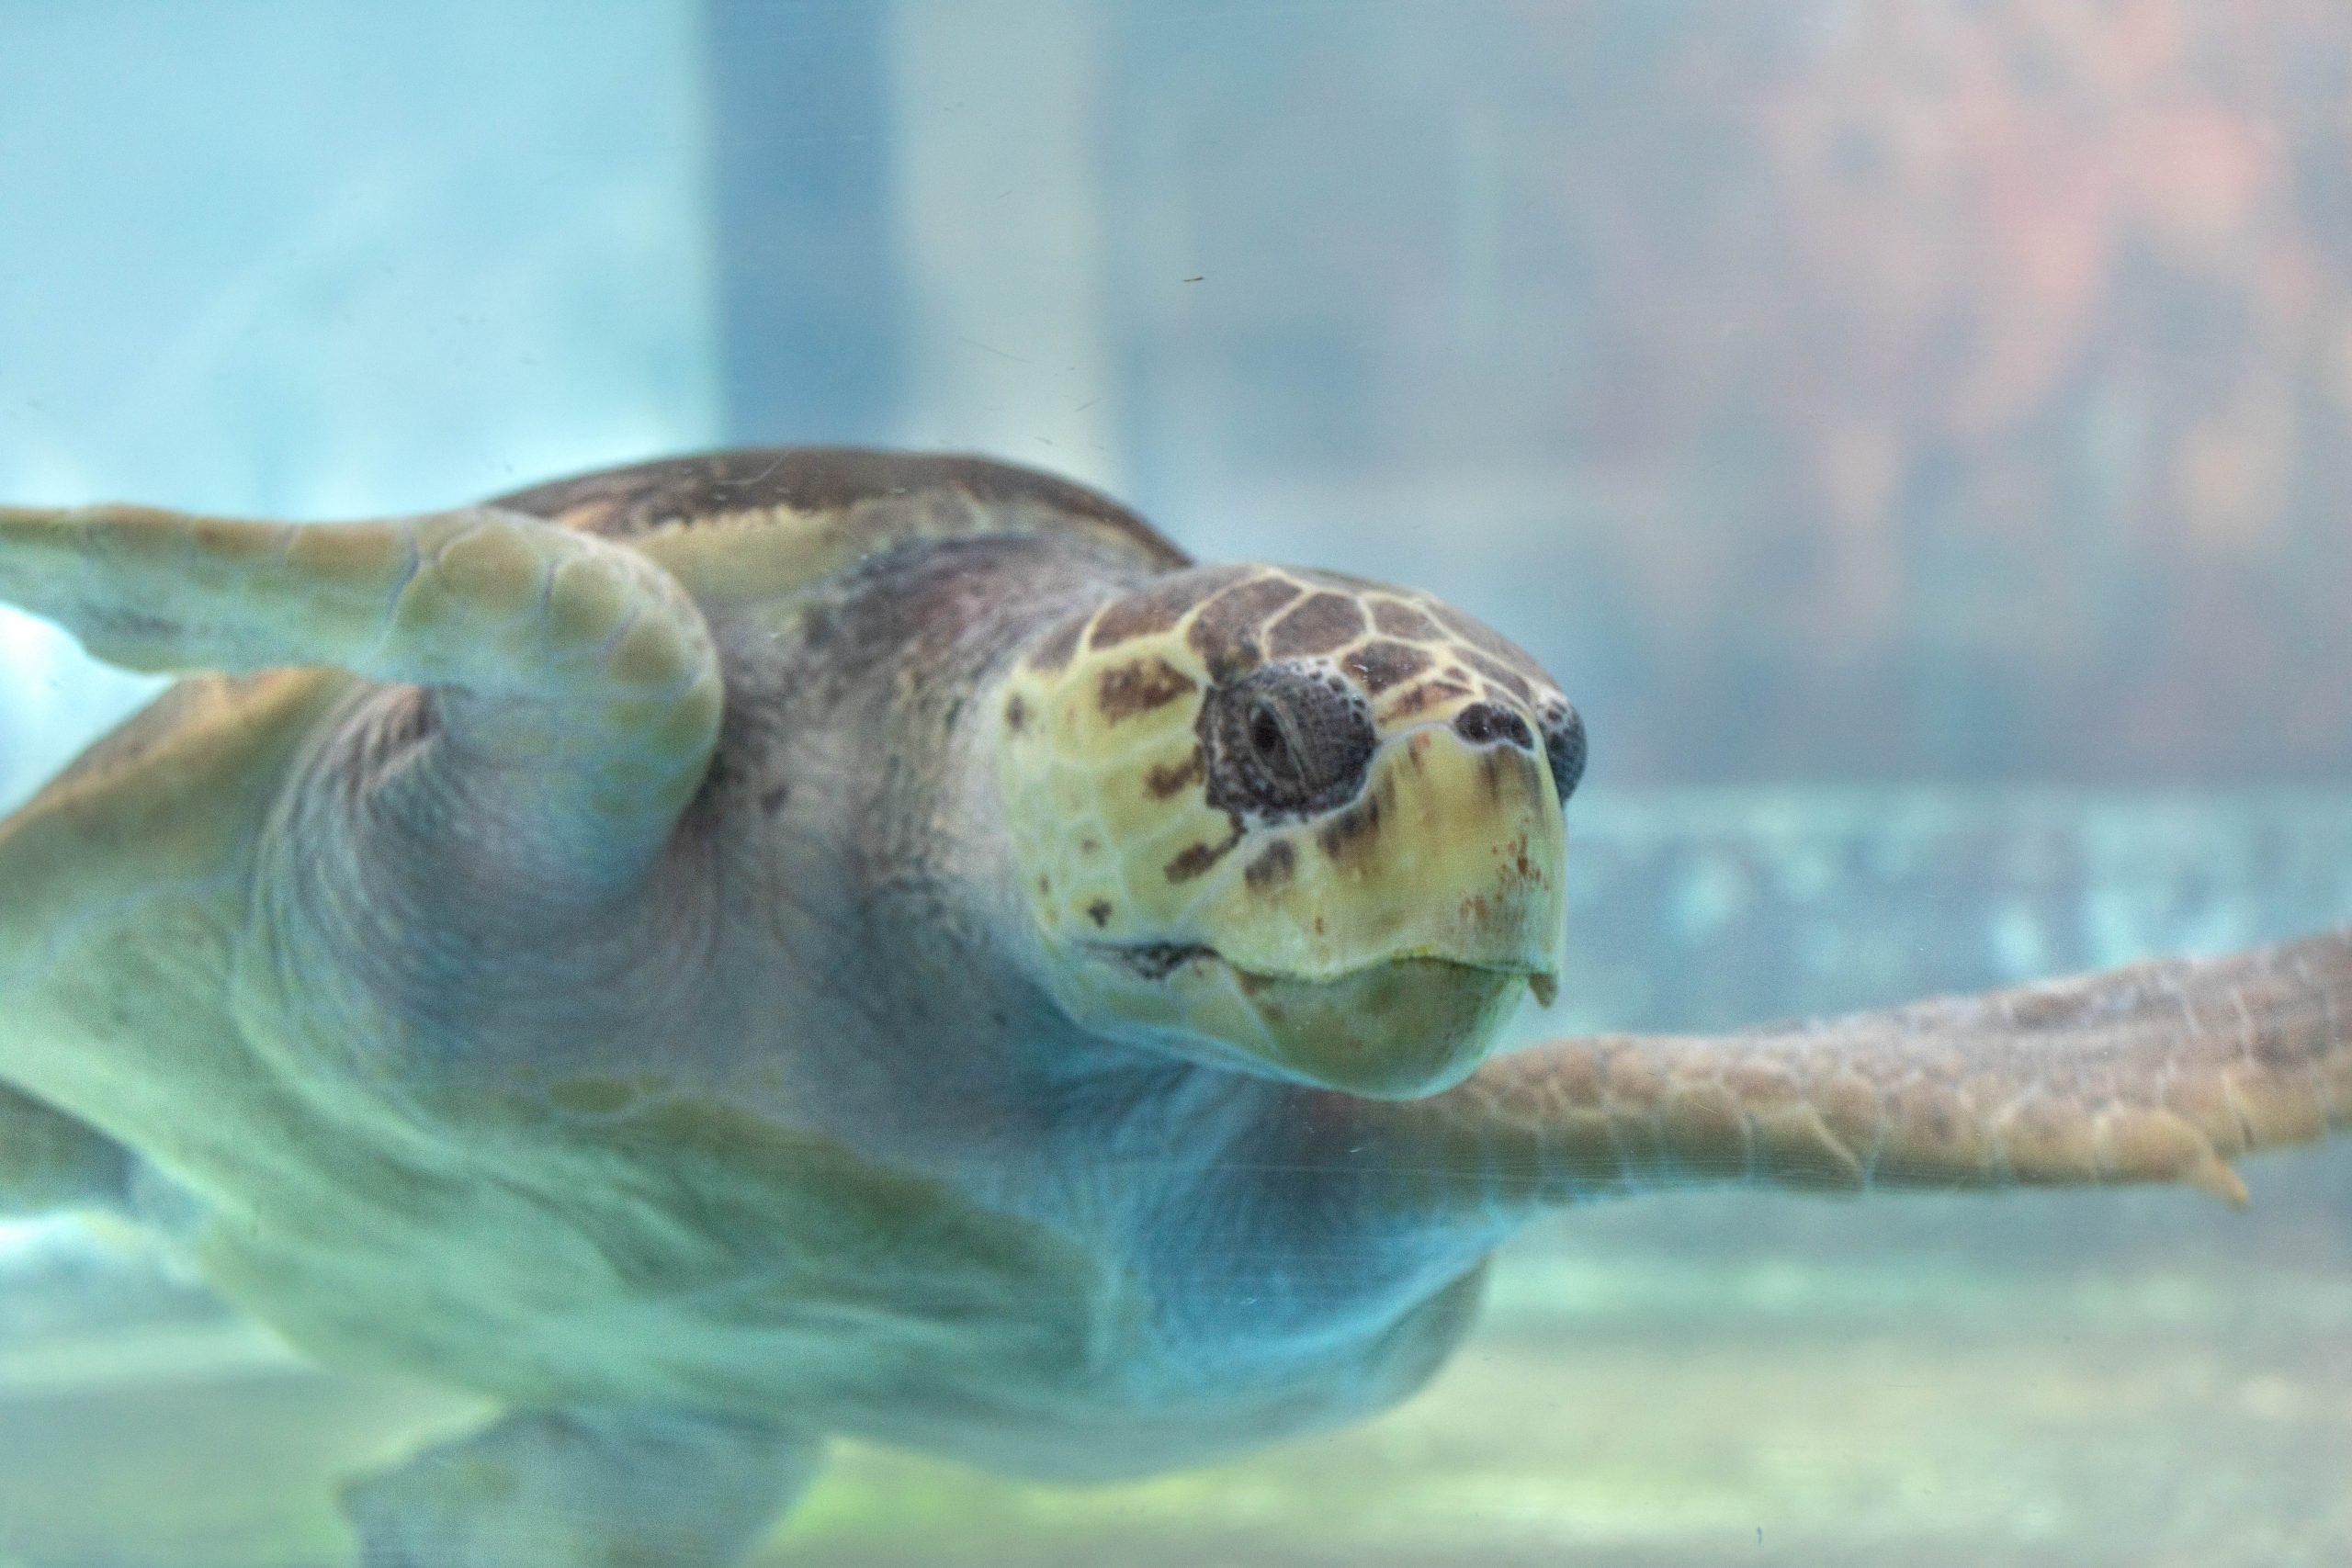 Sea Turtle at The South Carolina Aquarium & Sea Turtle Care Center Photographed by Luxury Travel Writer Annie Fairfax